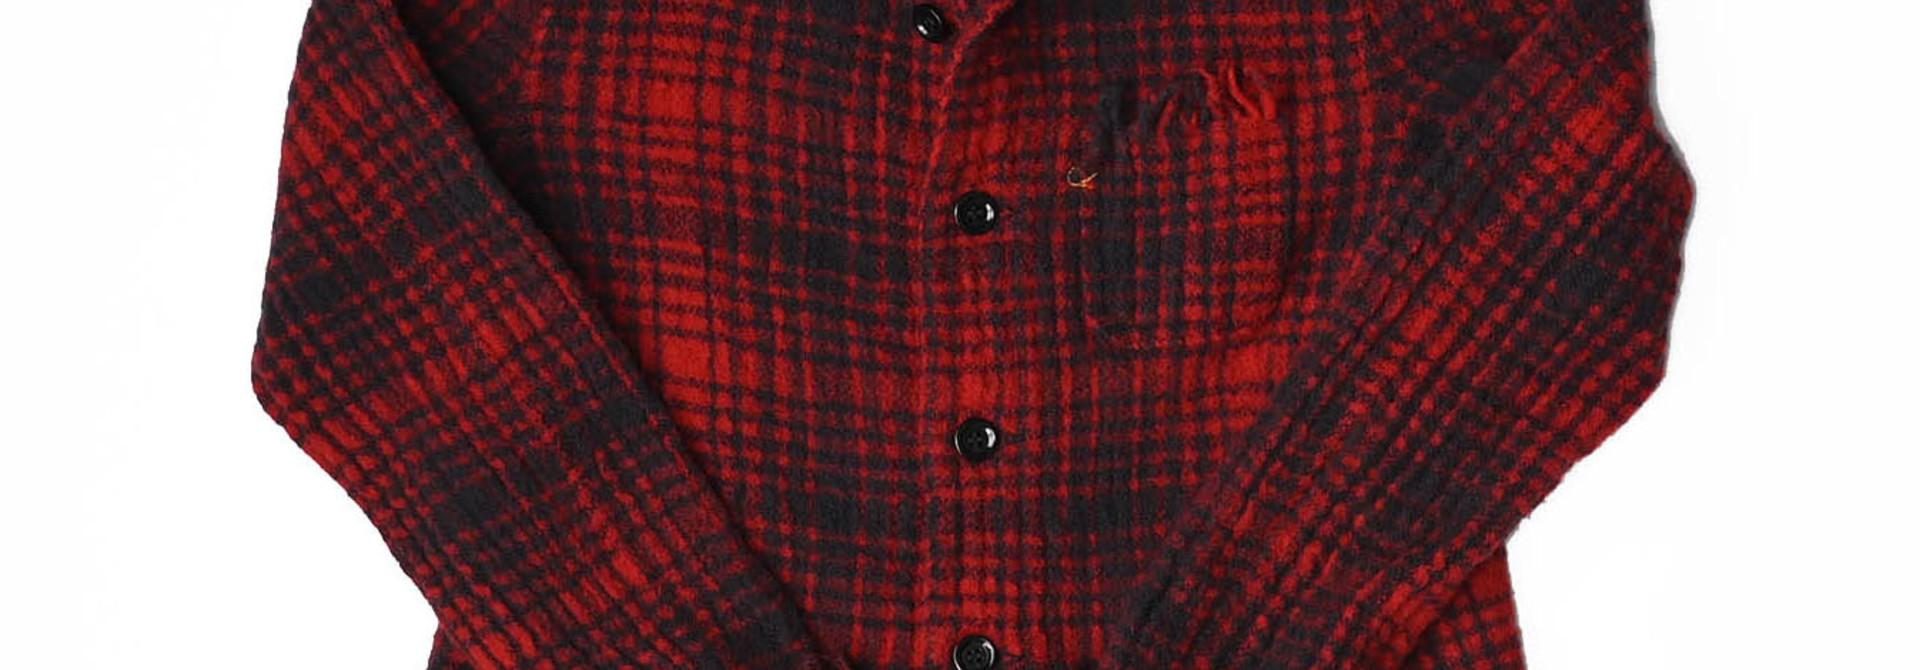 Indian Boiled Merino Check Jacket